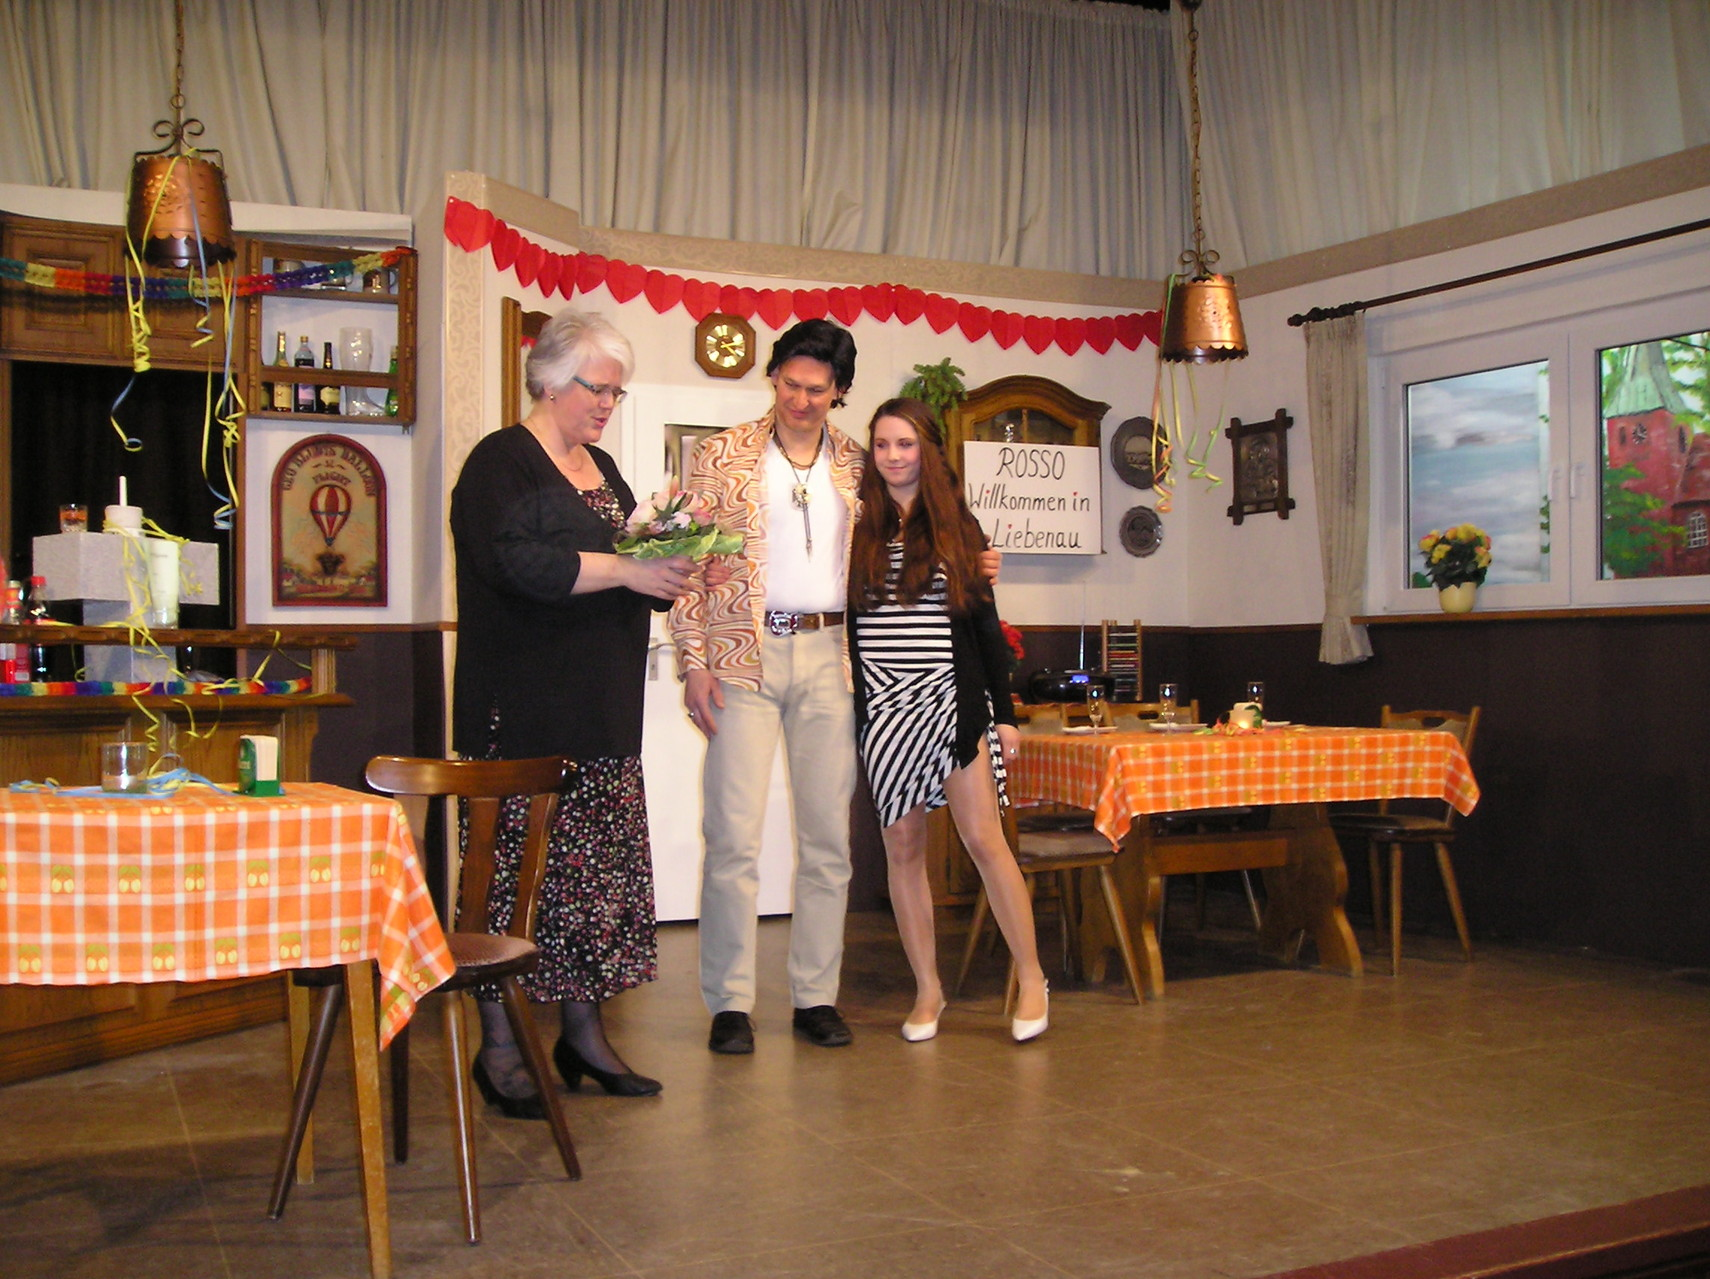 Mirjam Koloff, Volker Kauffeldt, Louisa Dumke